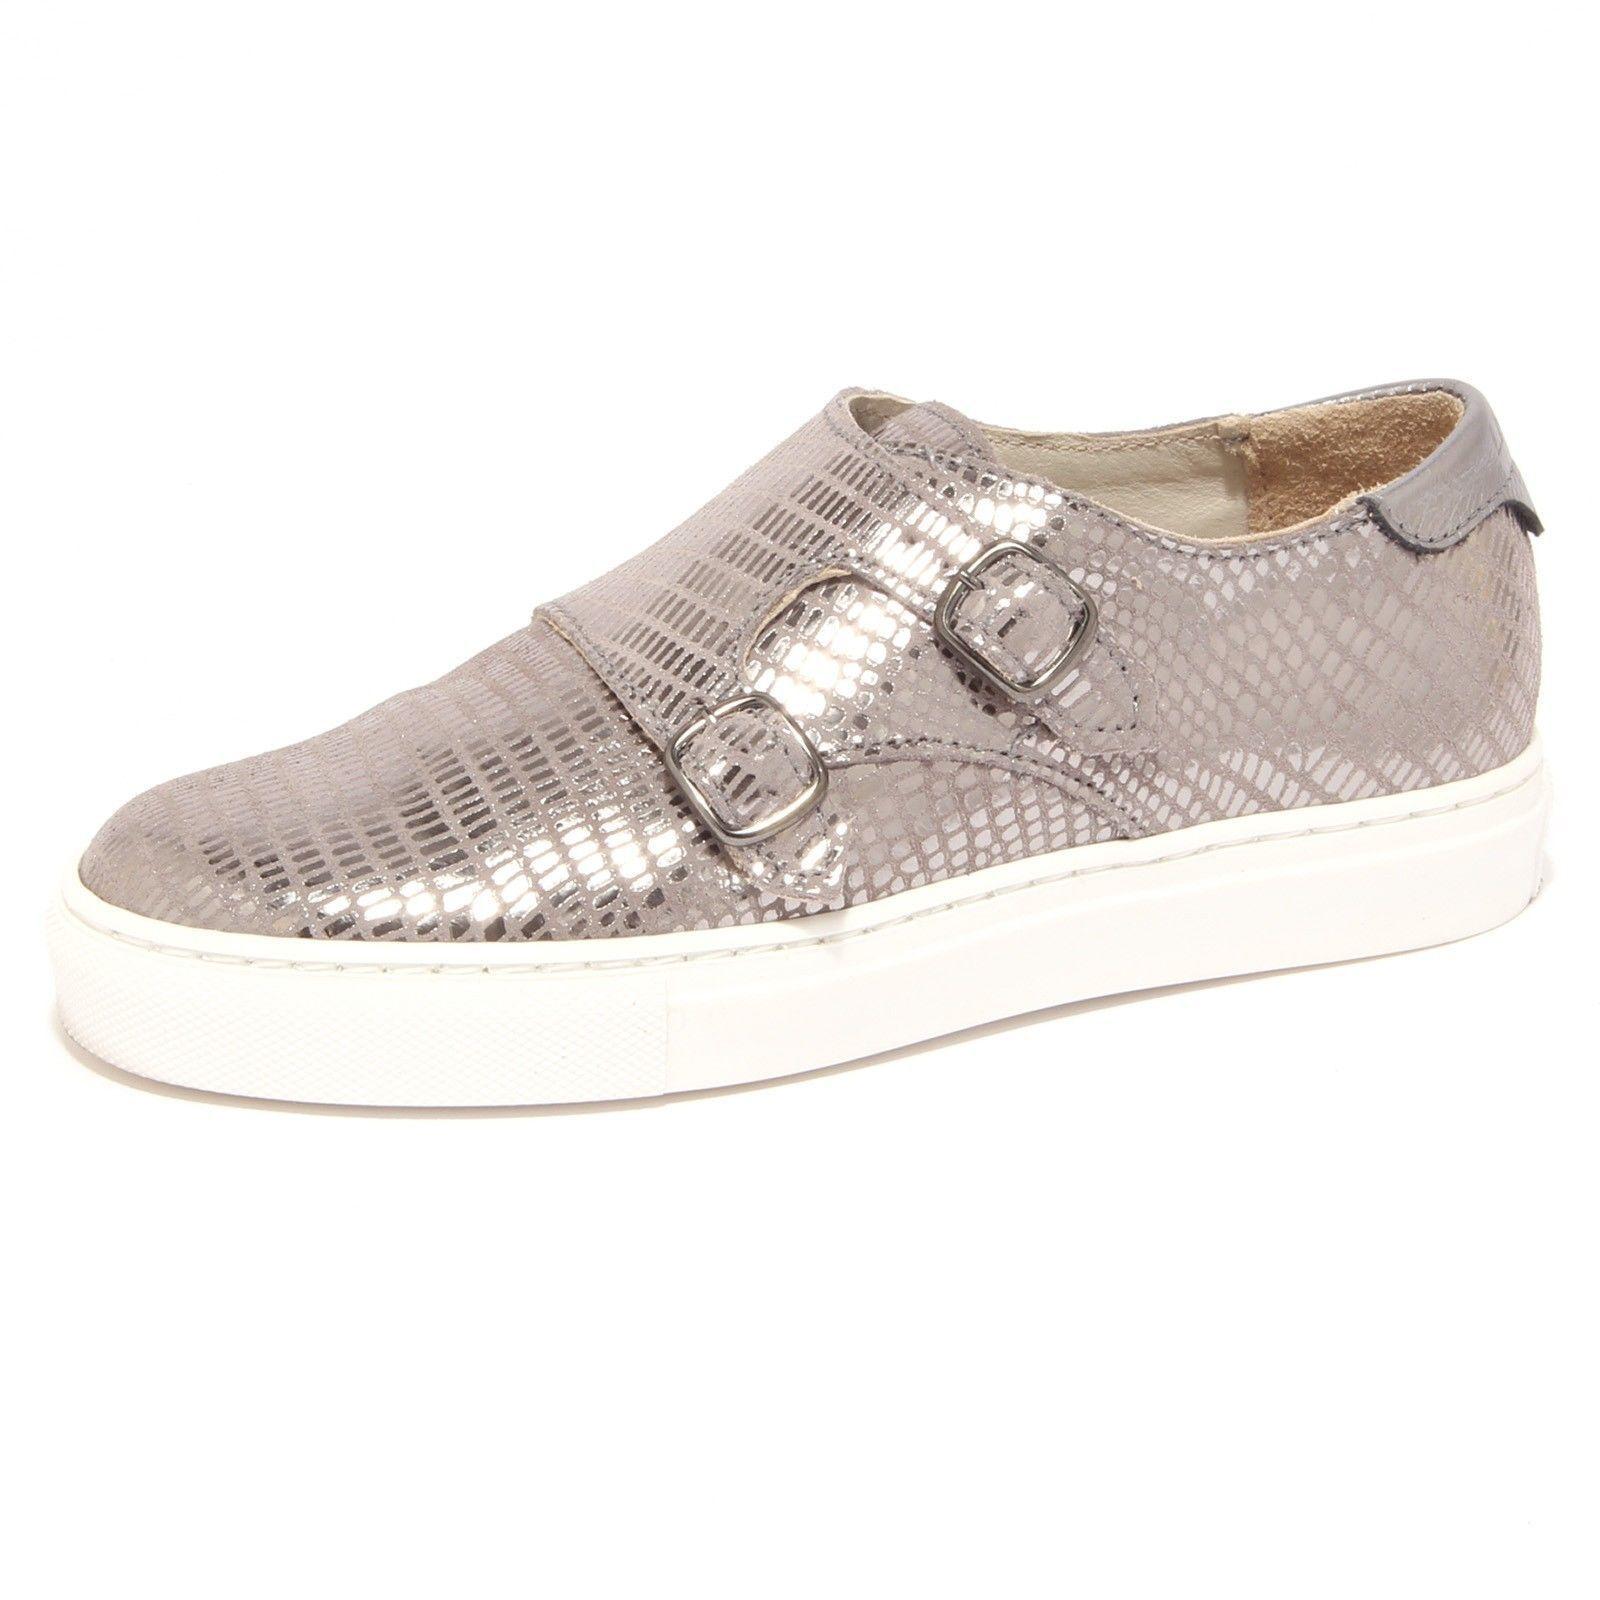 Zapatos Zapatillas Mujer Liu Jo Monk Strap Marie S16107 P0188 04155 Peltre Met